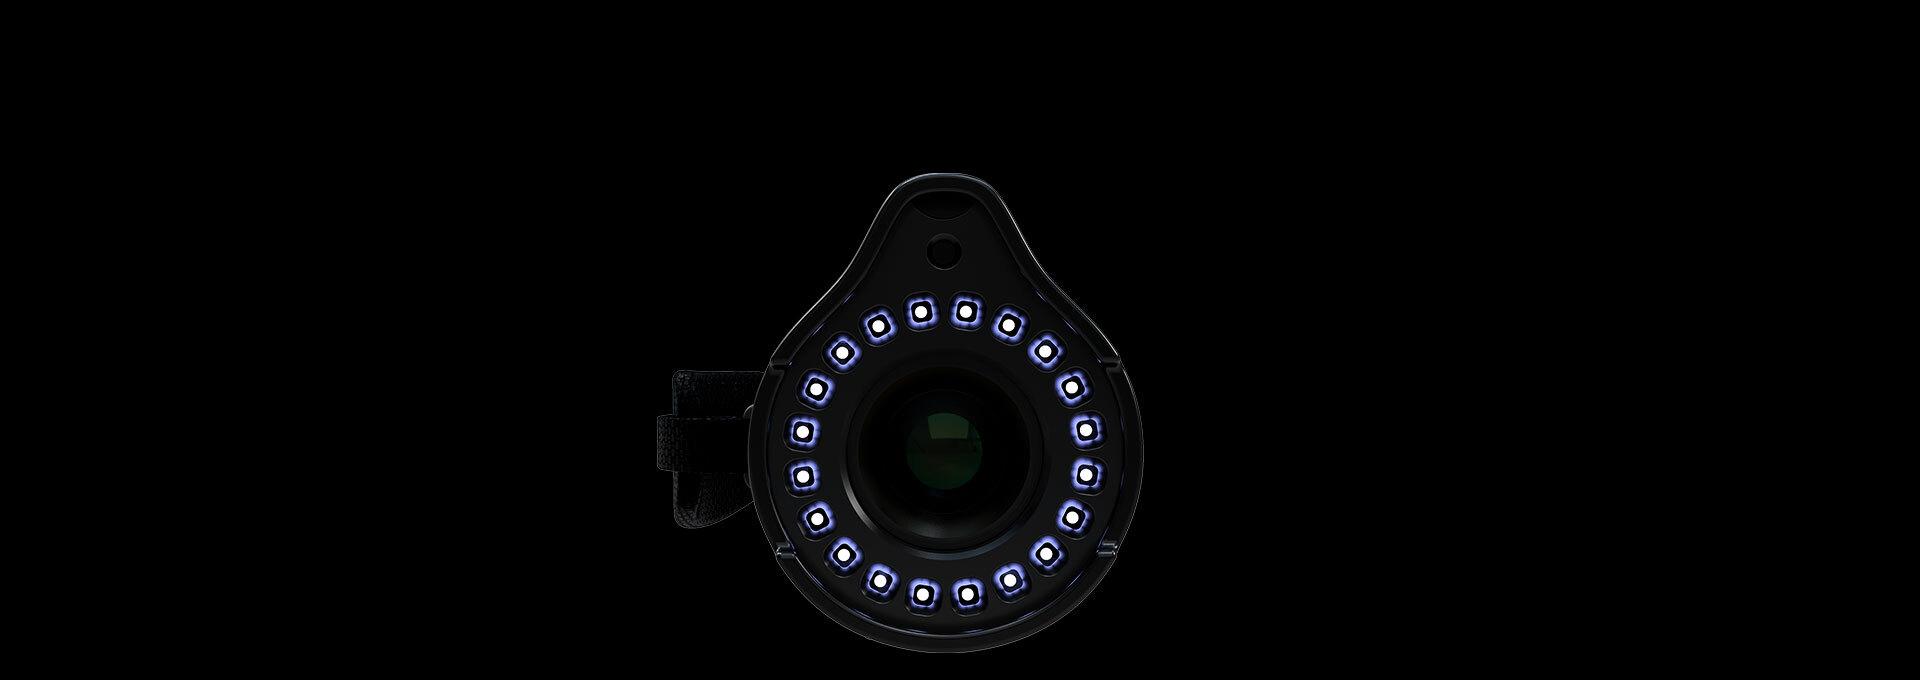 MSCAN-L15全局摄影测量系统特点